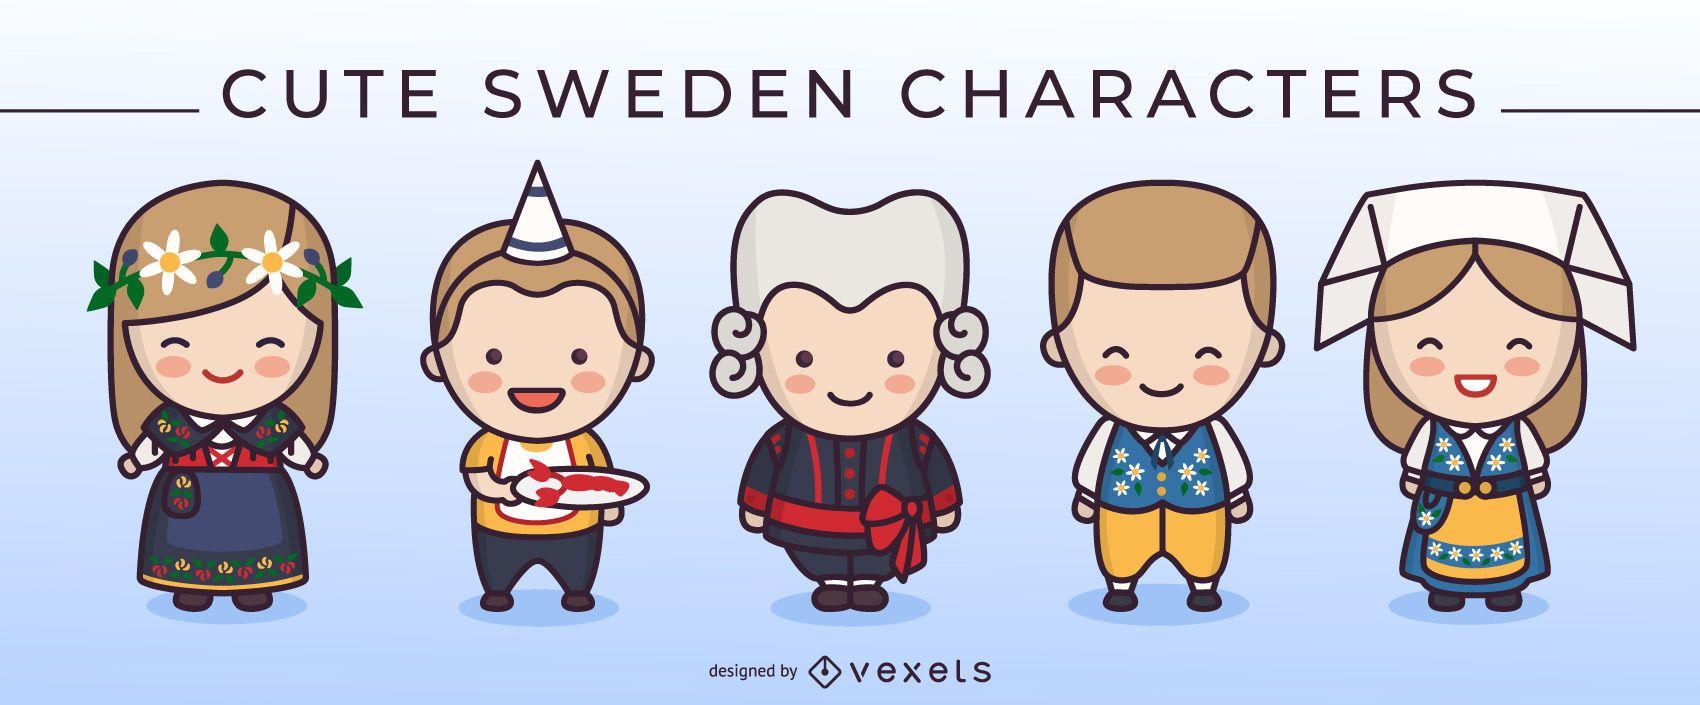 Cute Sweden Cartoon Character Pack